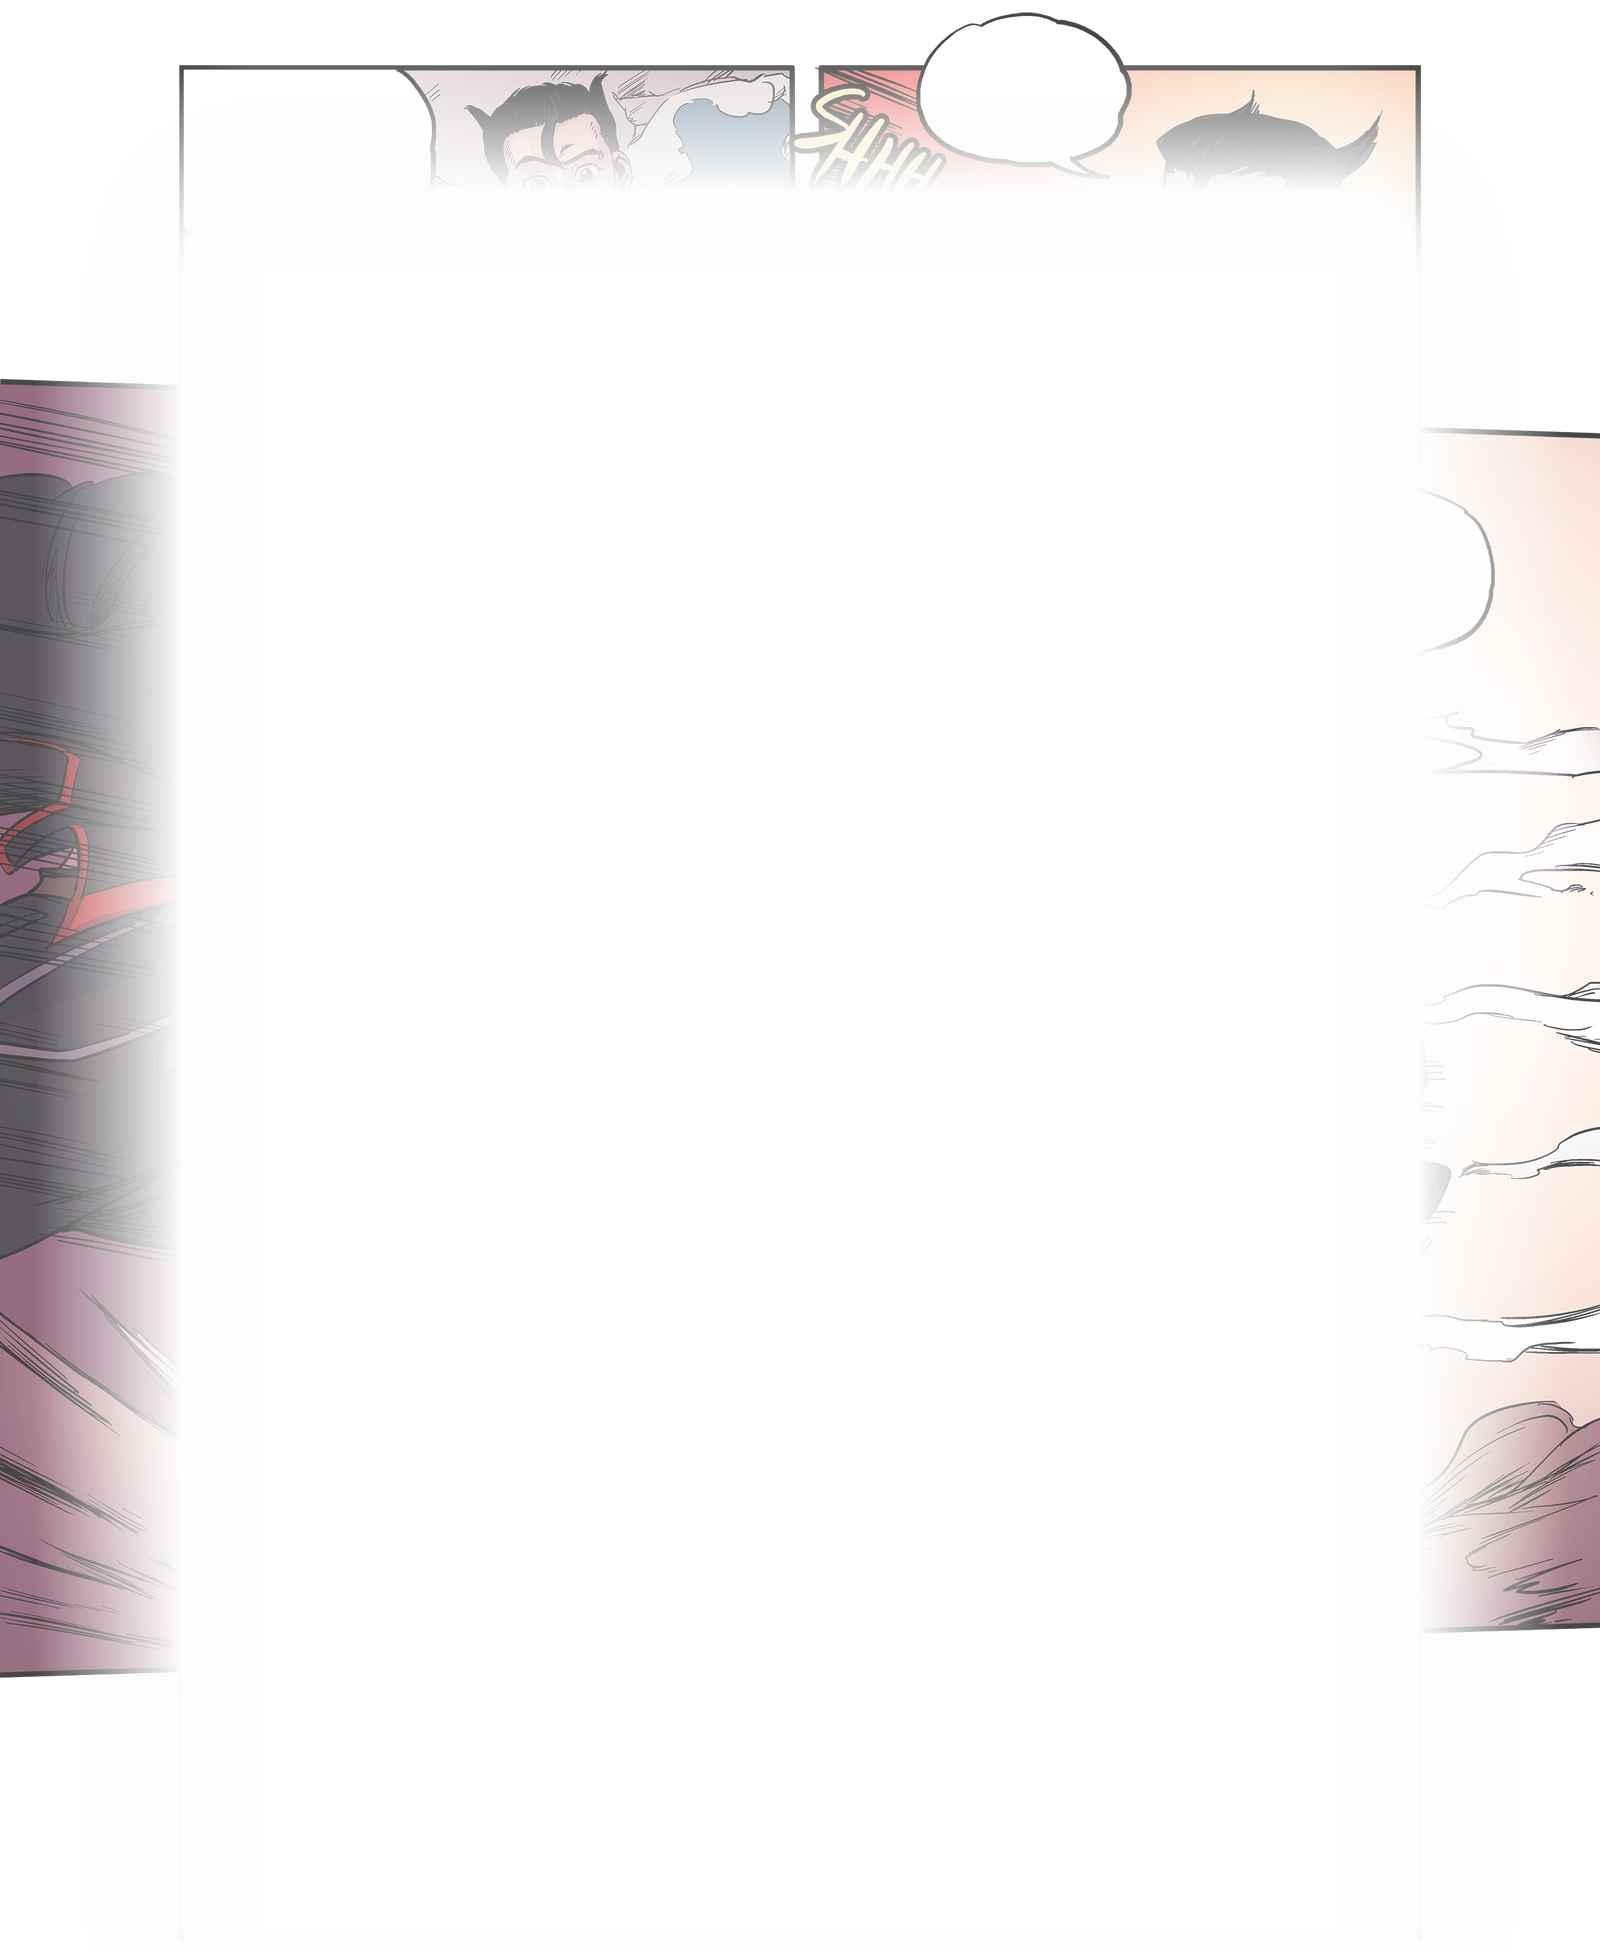 Amilova : Chapitre 7 page 16